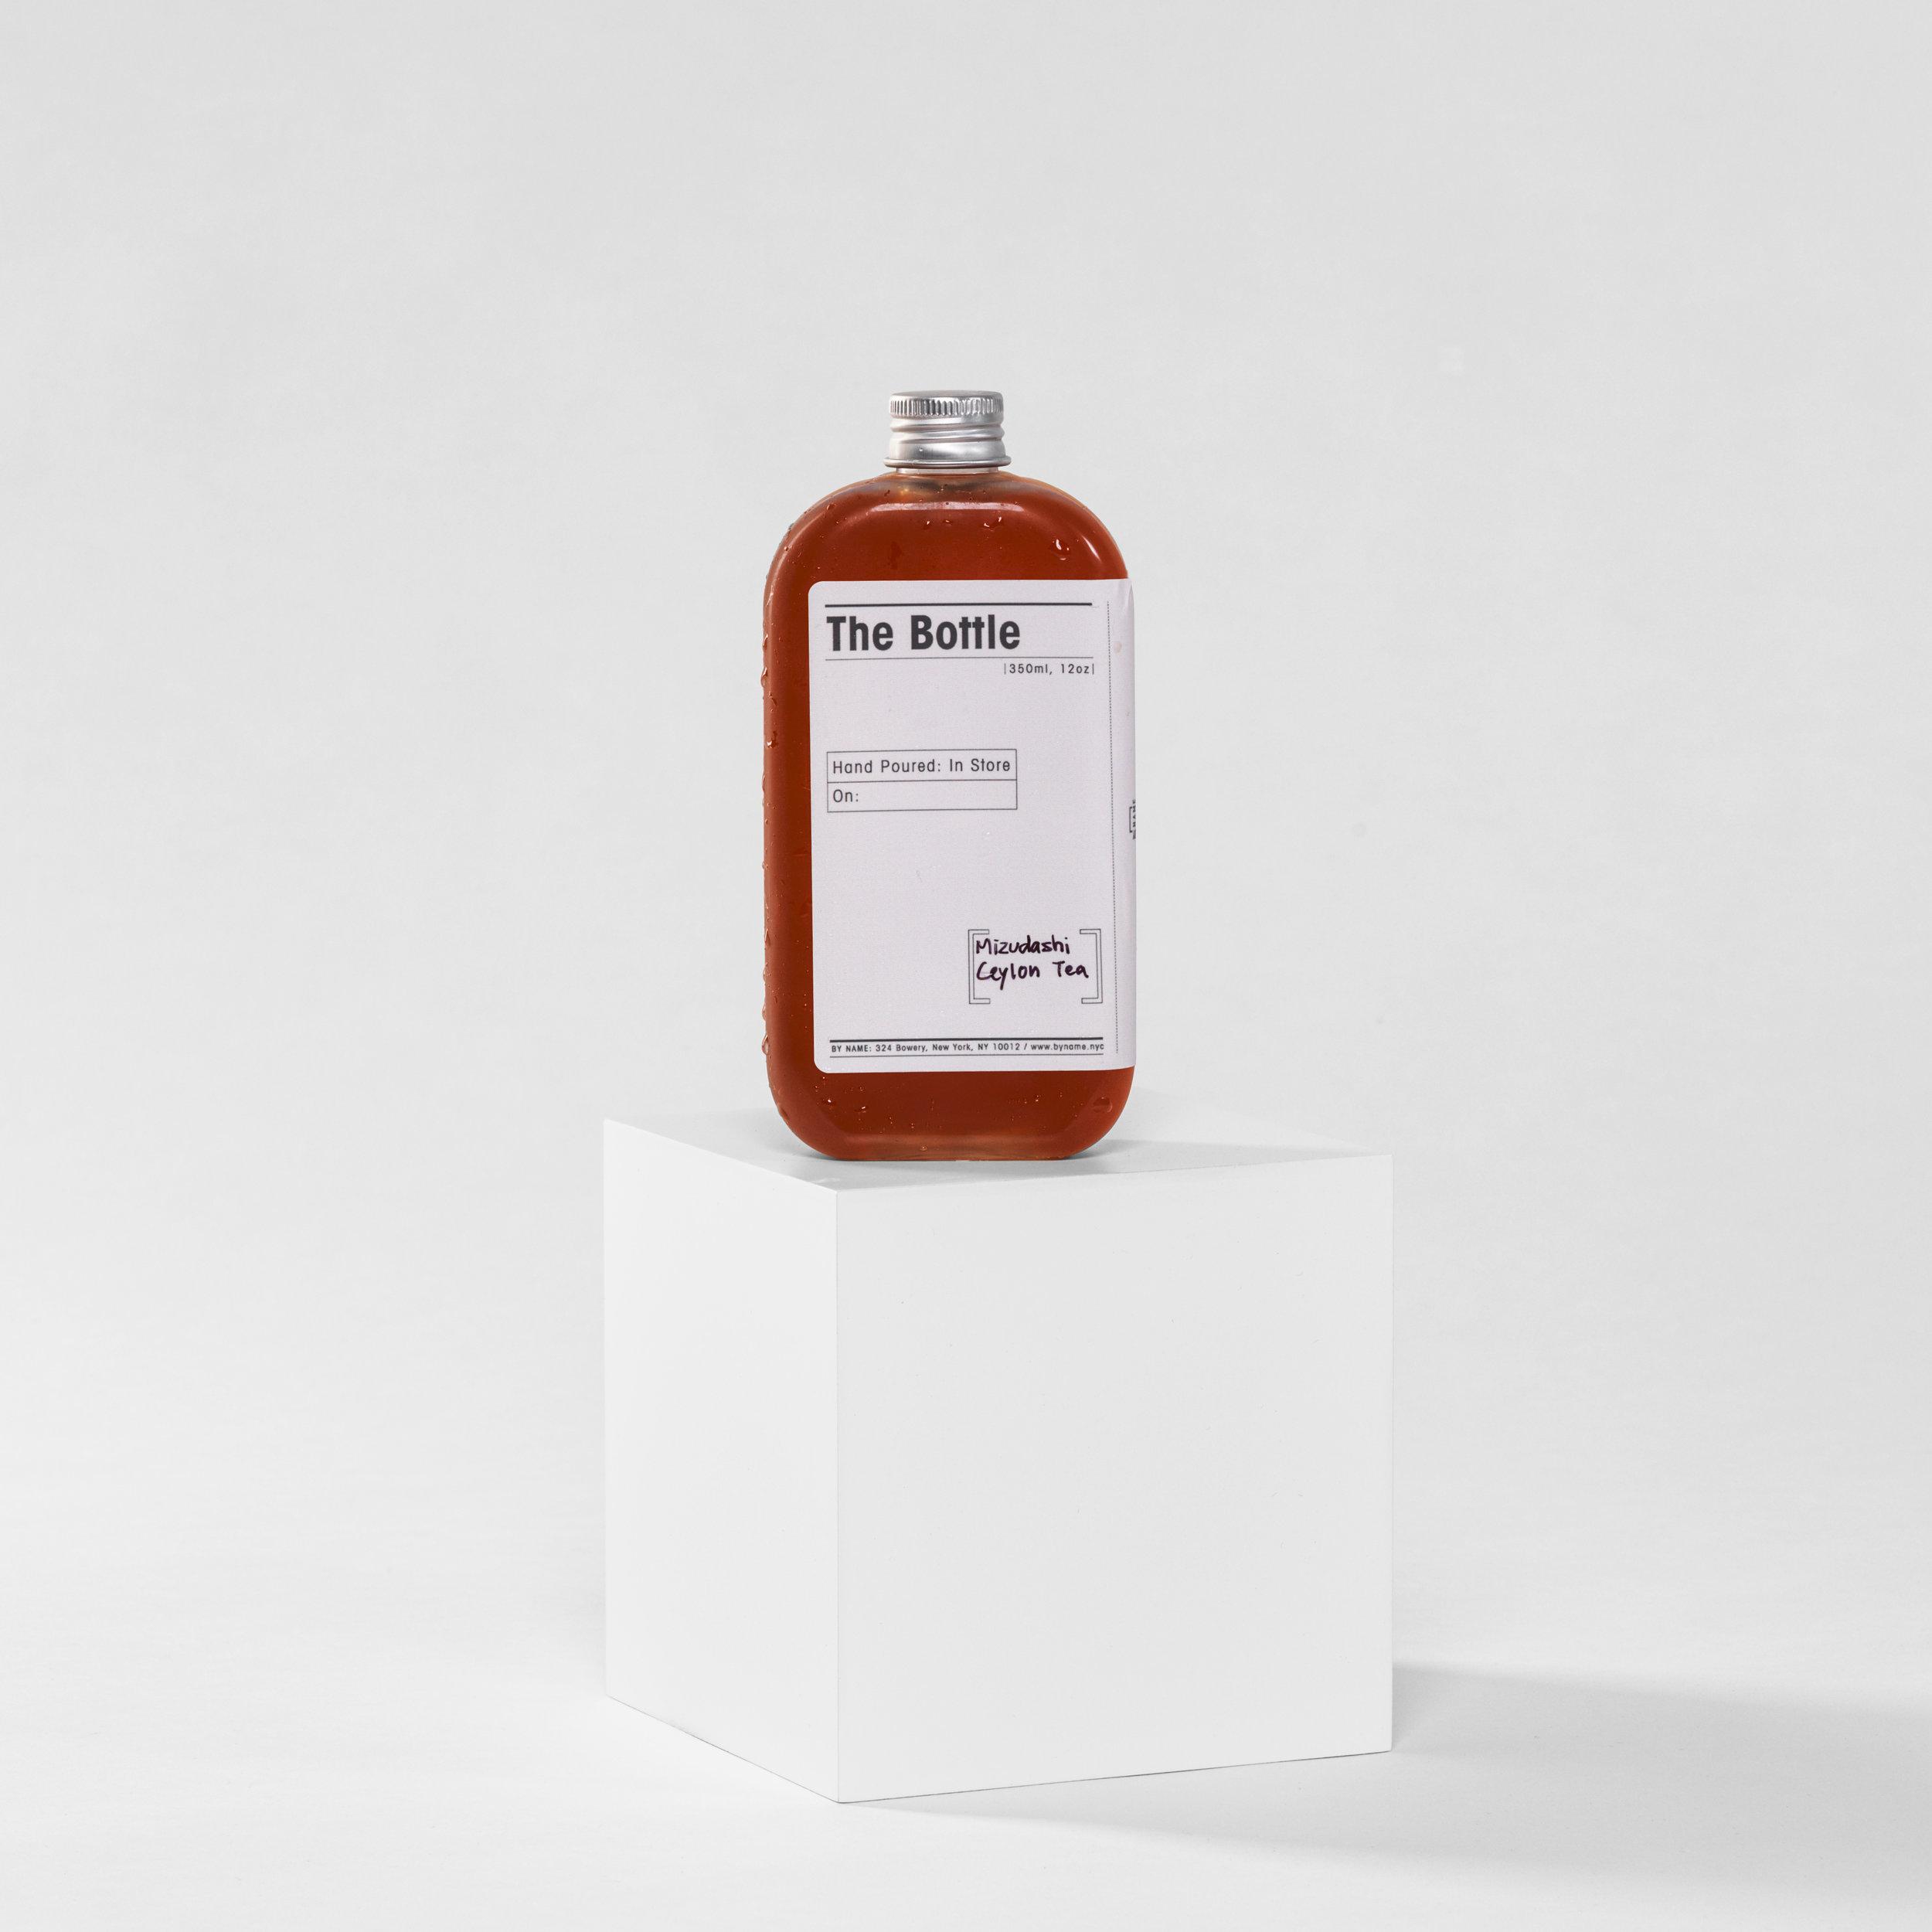 bottle-mizudashiceylontea.jpg